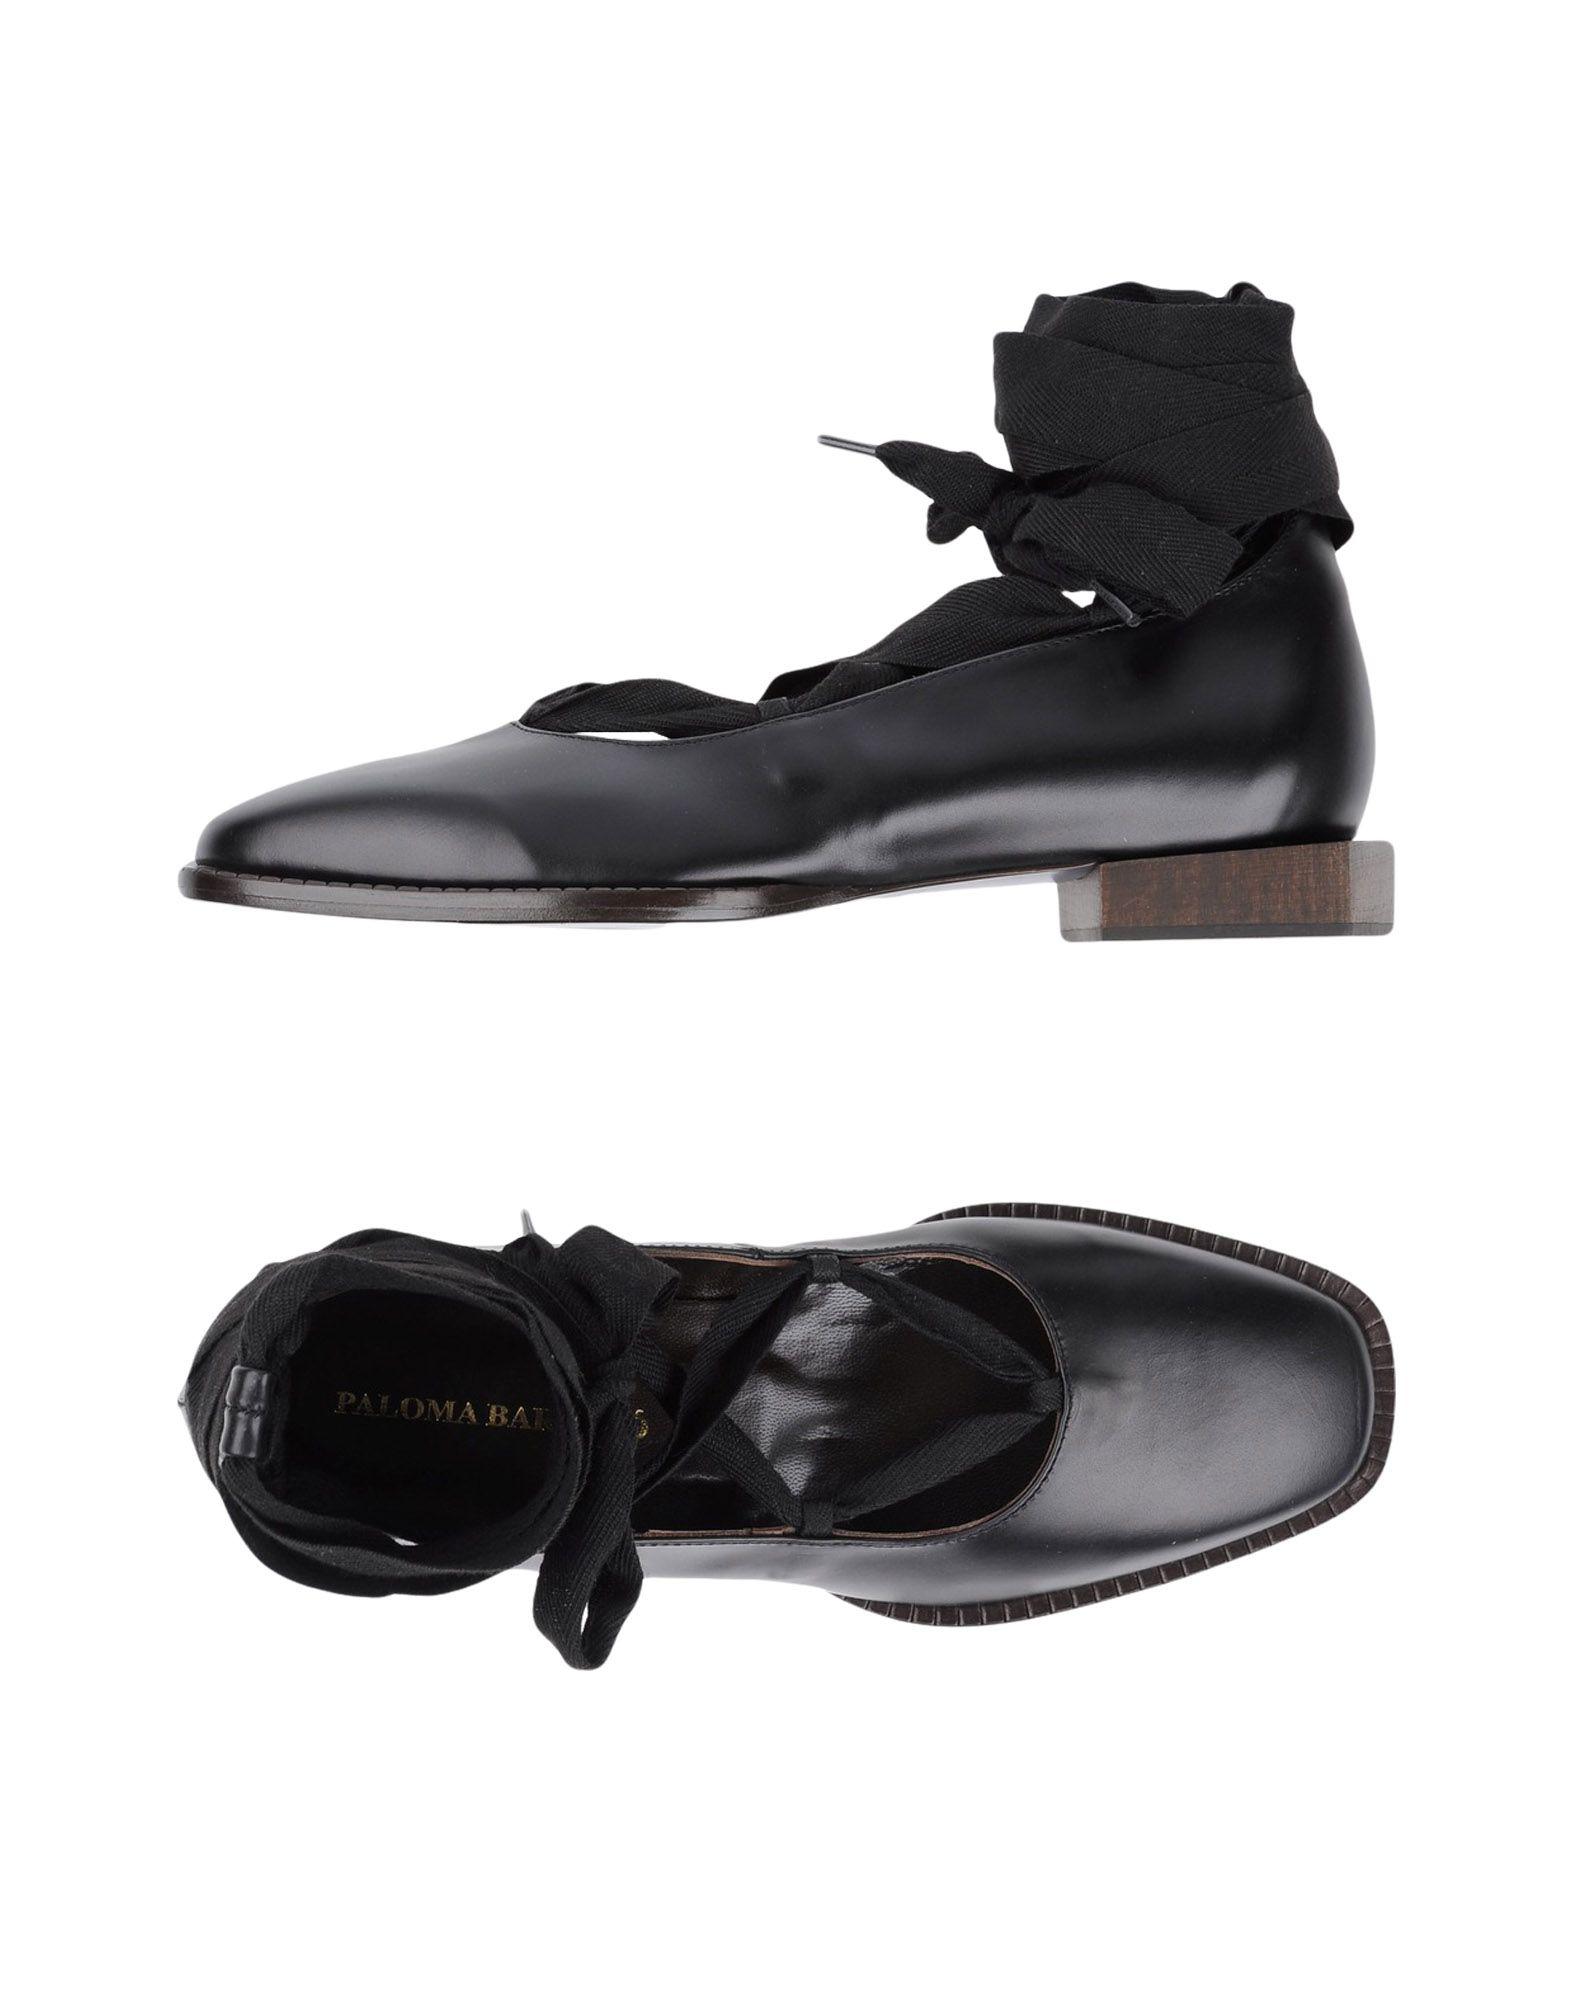 Paloma Barceló Pumps Damen  11224111RK Gute Qualität beliebte Schuhe